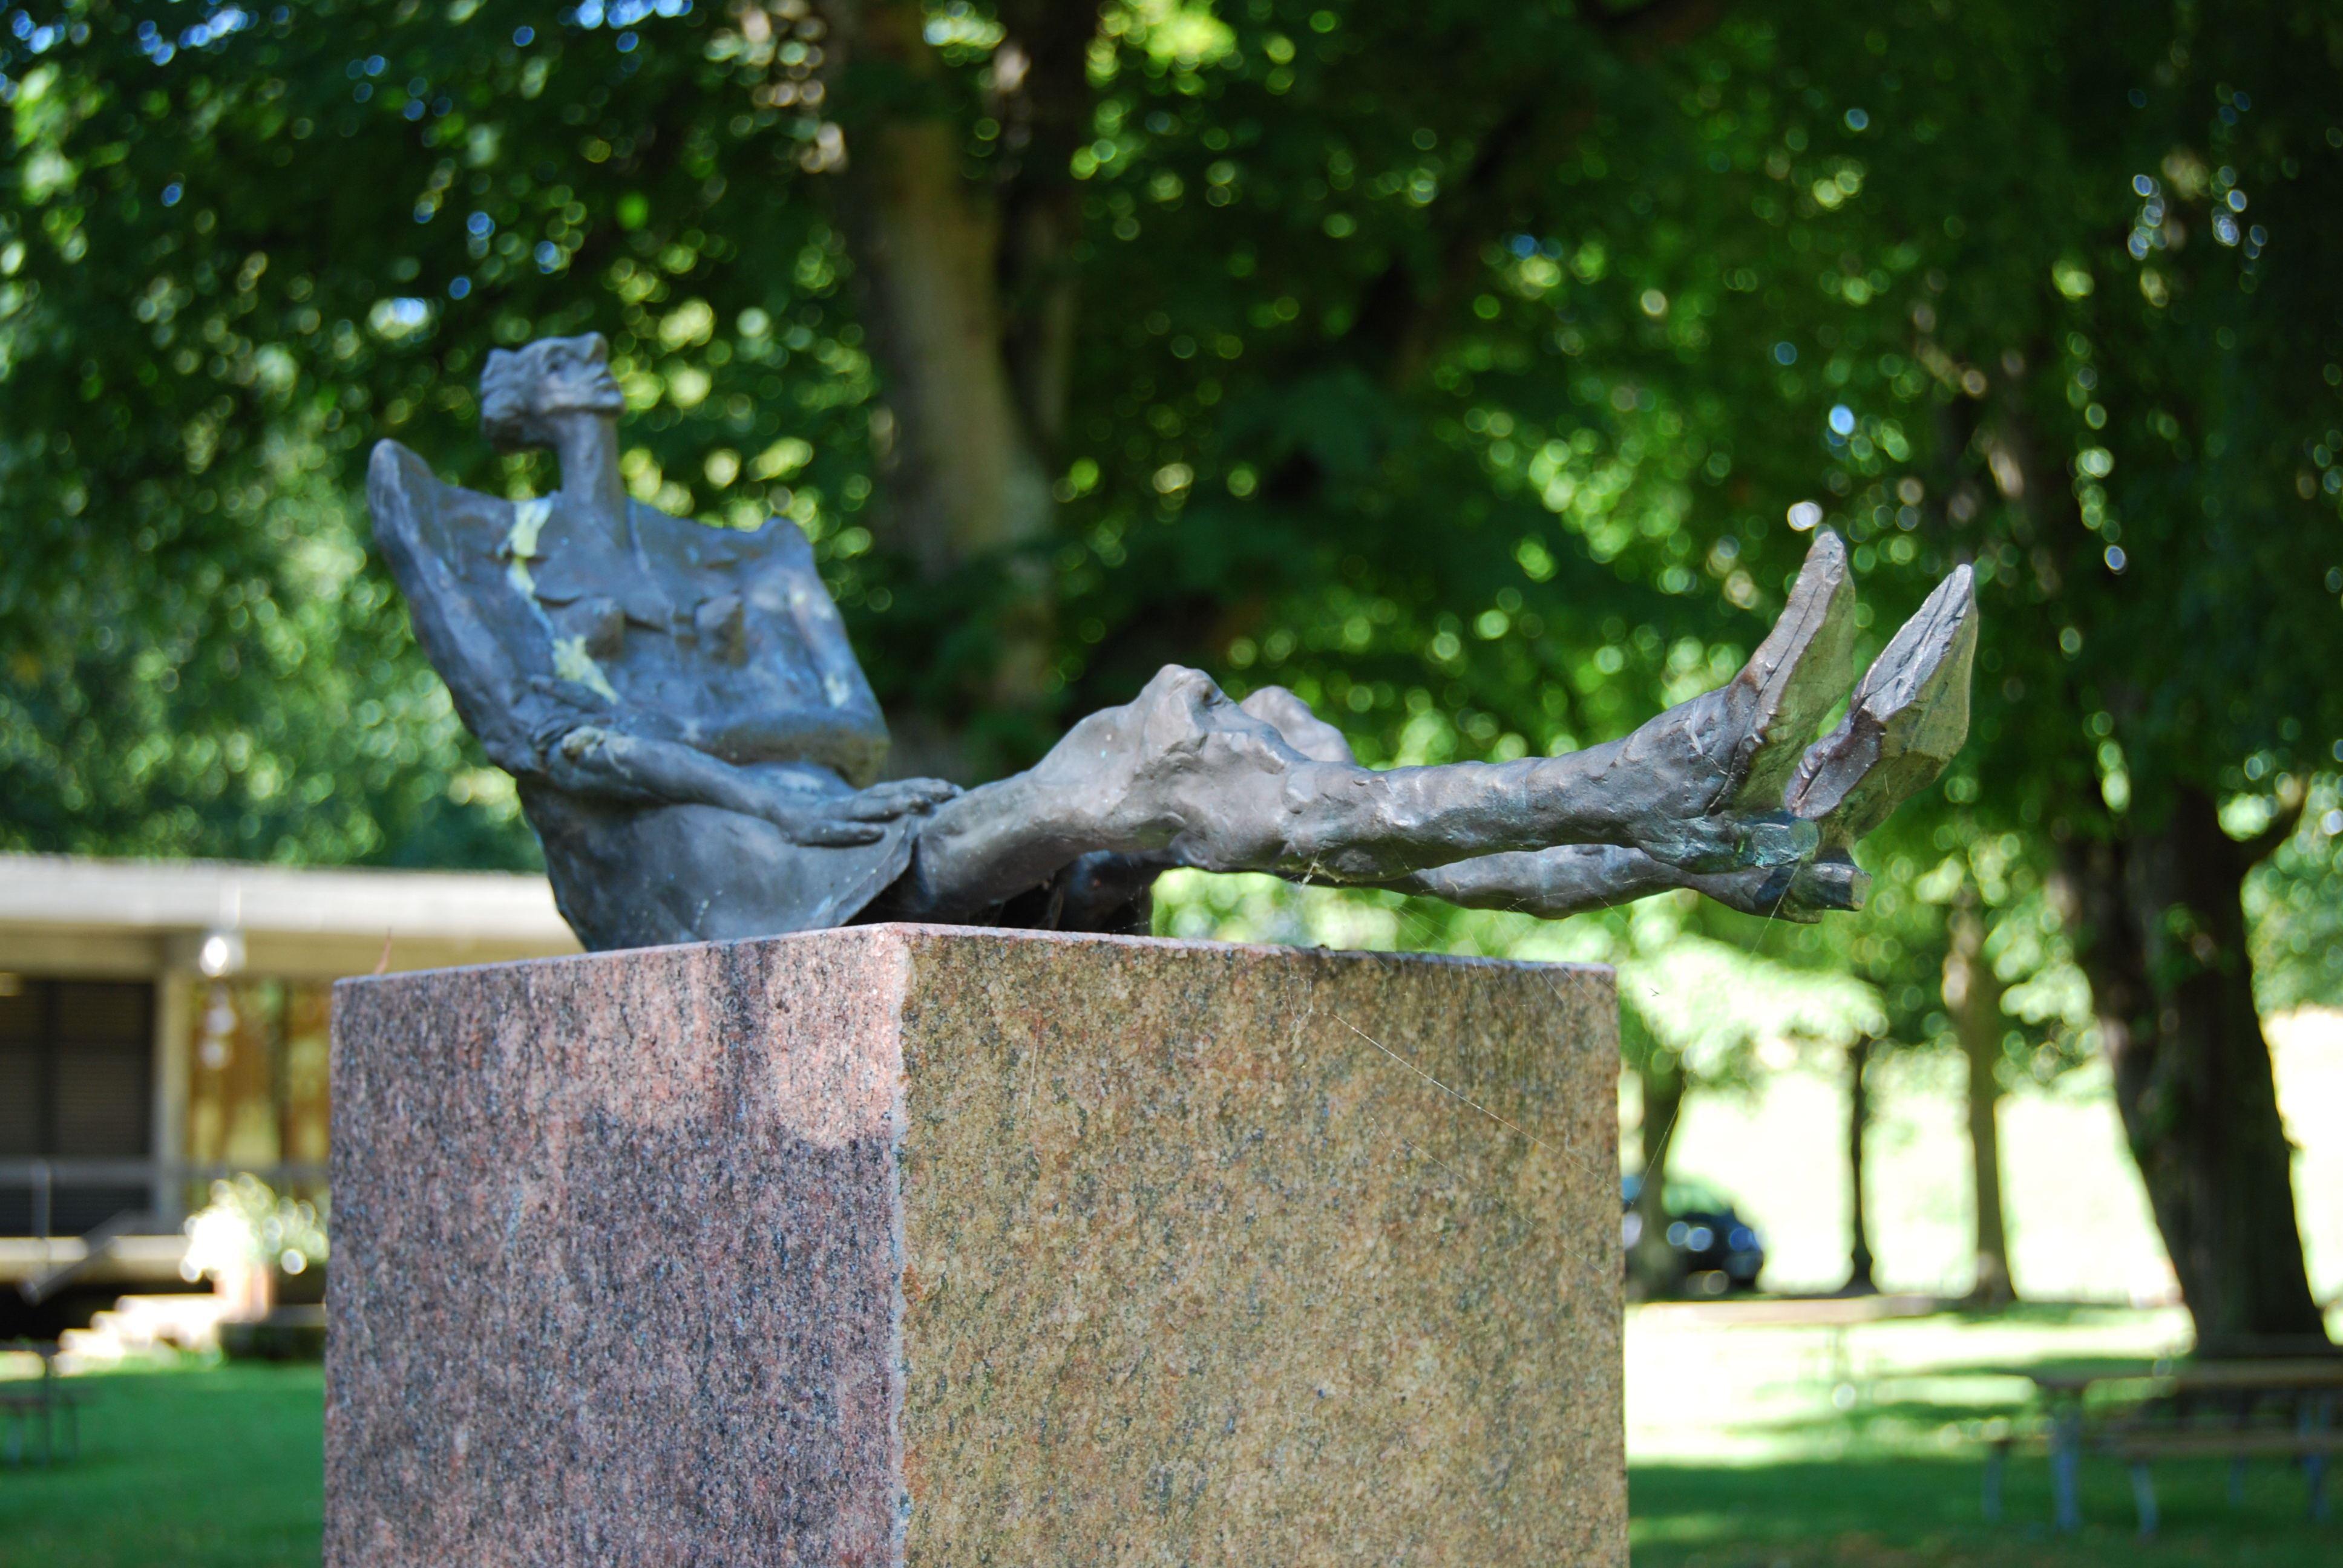 Foto: Turistbyrån Landskrona - Ven, Kaptensgårdens skulpturpark